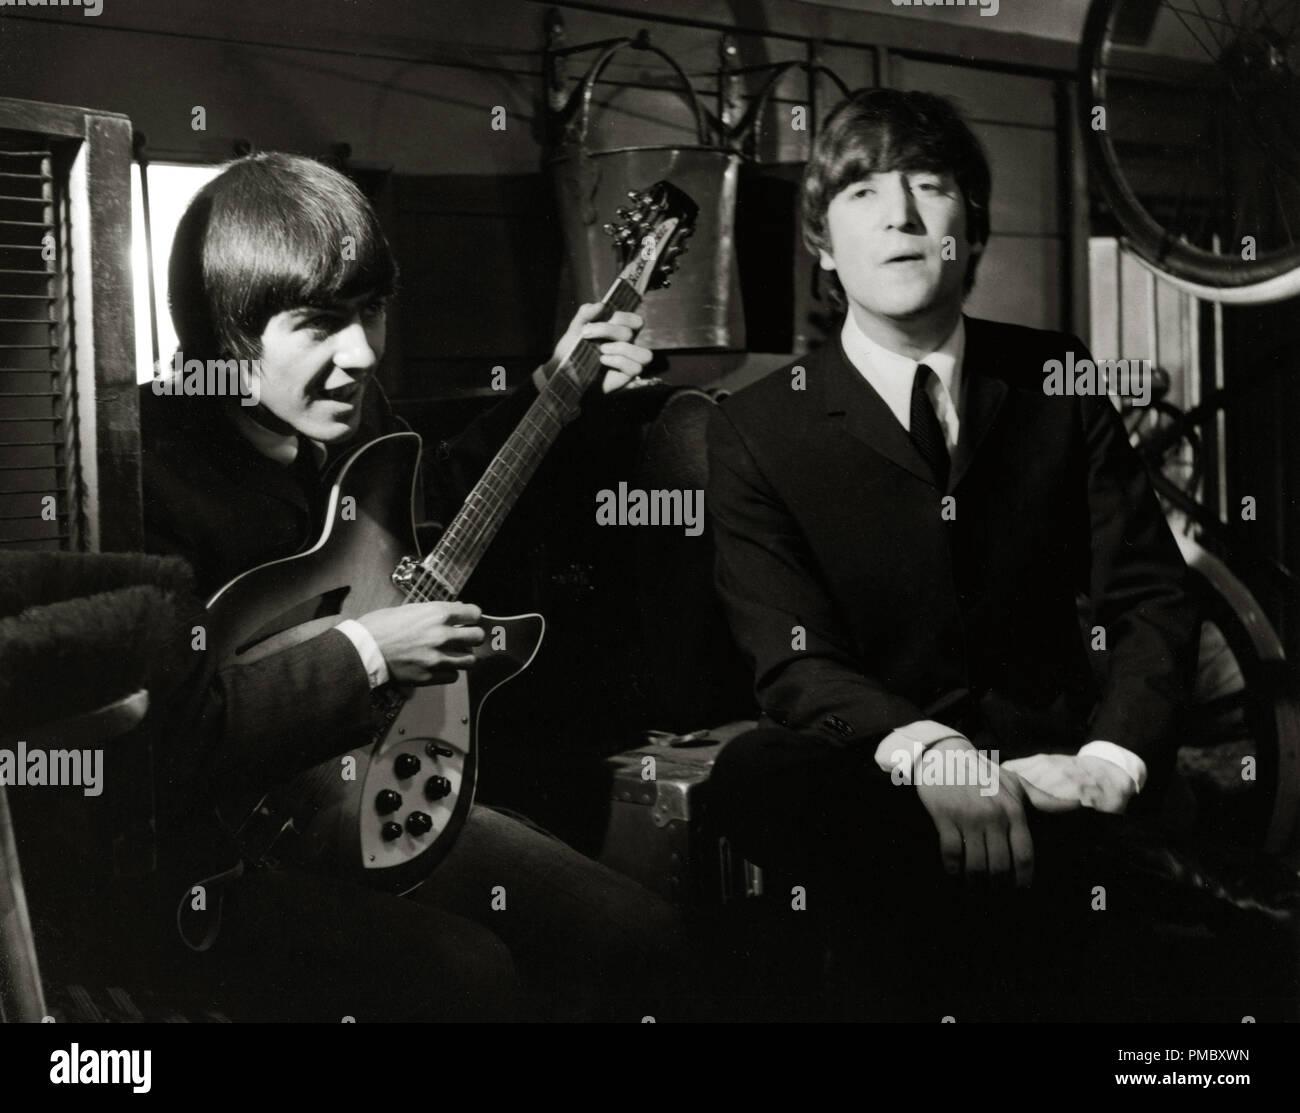 Beatles, George Harrison, John Lennon, 'A Hard Days Night', a Janus Films release, 1964 File Reference # 33300_133THA - Stock Image